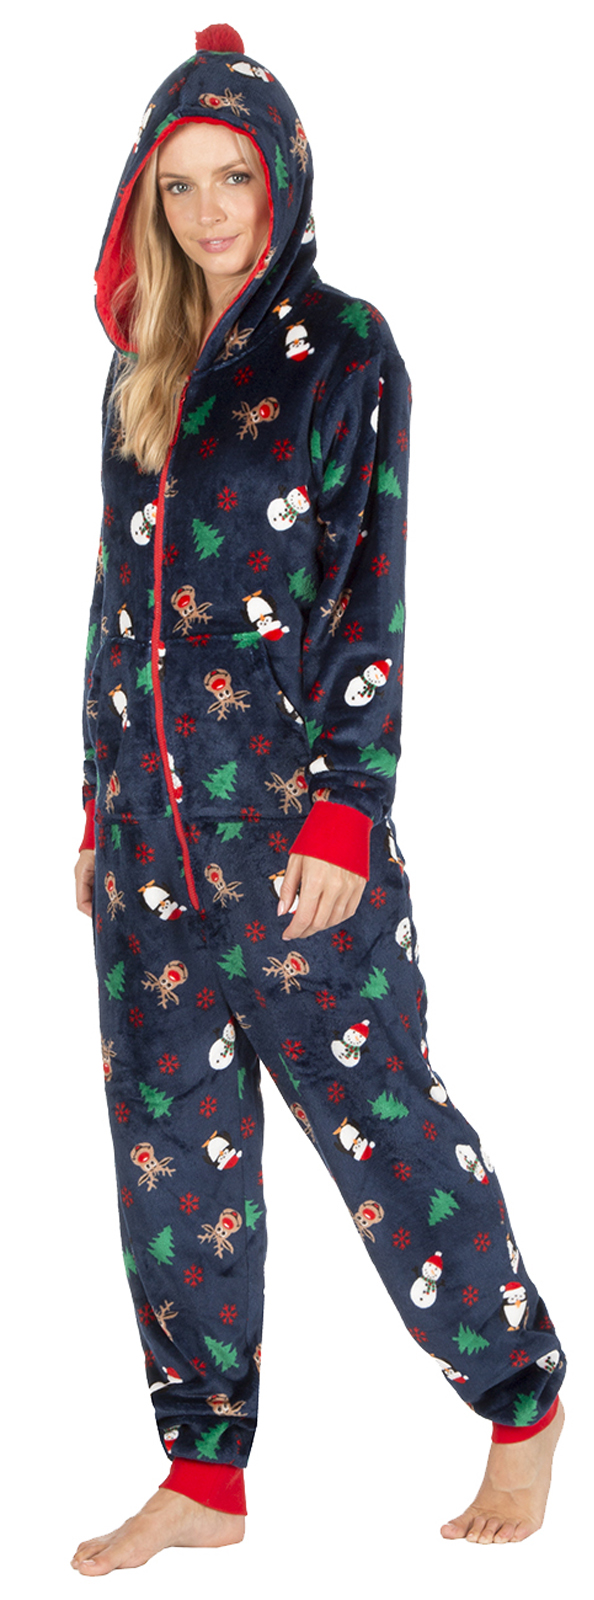 Womens Novelty Christmas Dressing Gown Onezie Xmas All In One Fleece Pyjamas